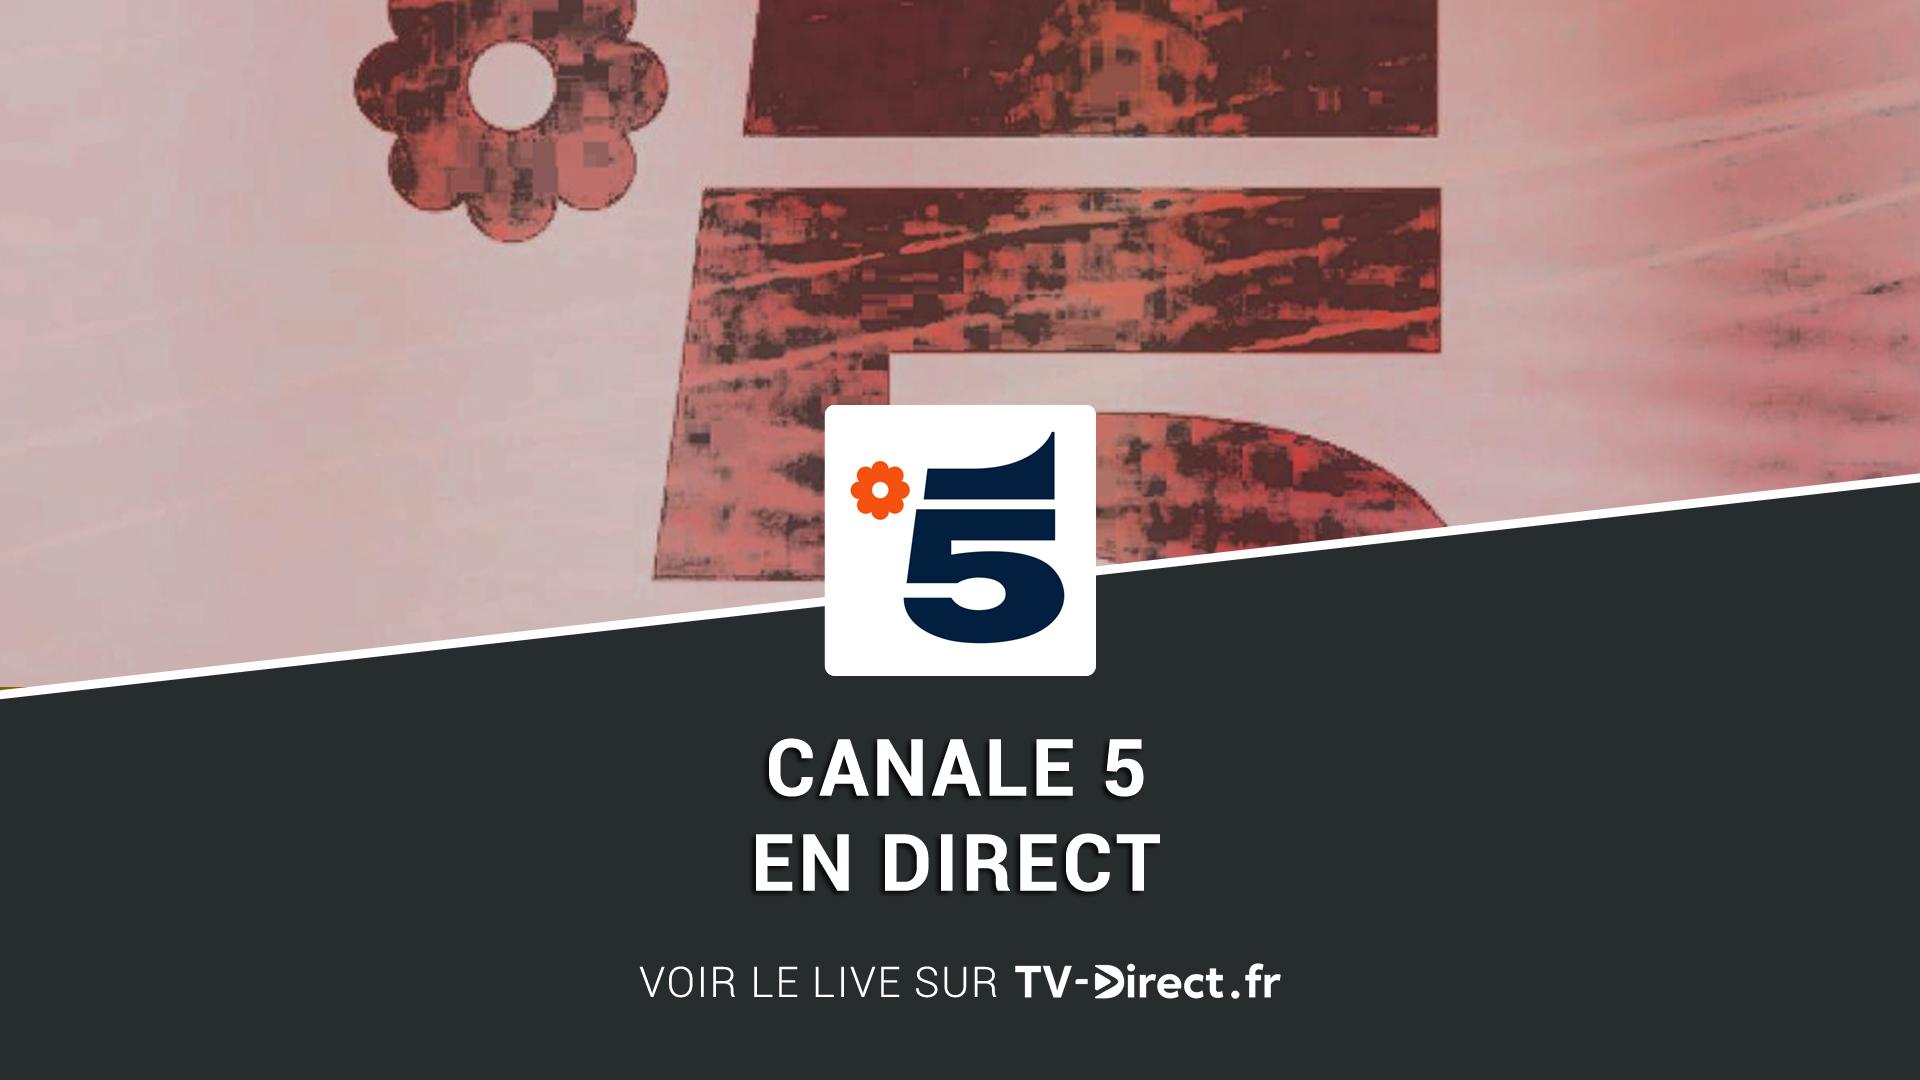 canale 5 direct regarder canale 5 streaming sur internet. Black Bedroom Furniture Sets. Home Design Ideas